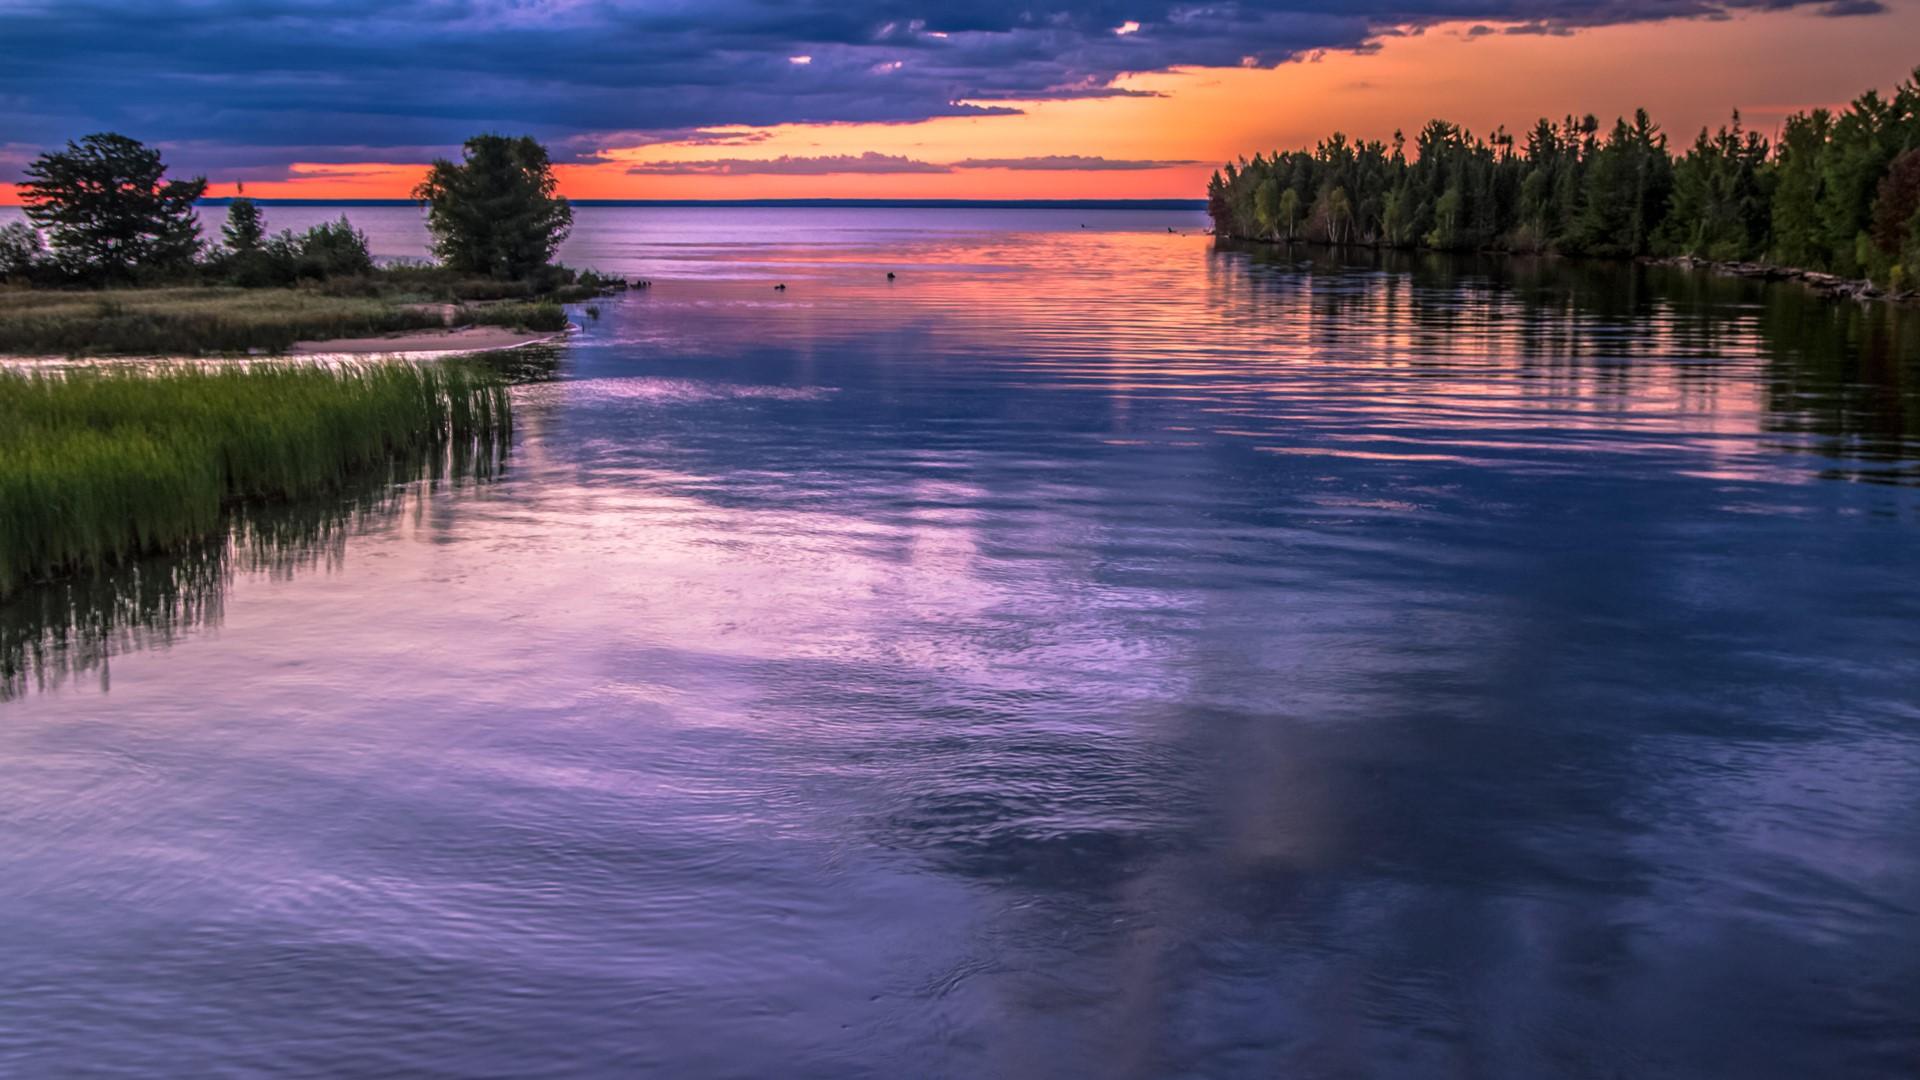 Sunset Over Tahquamenon River As It Enters Lake Superior